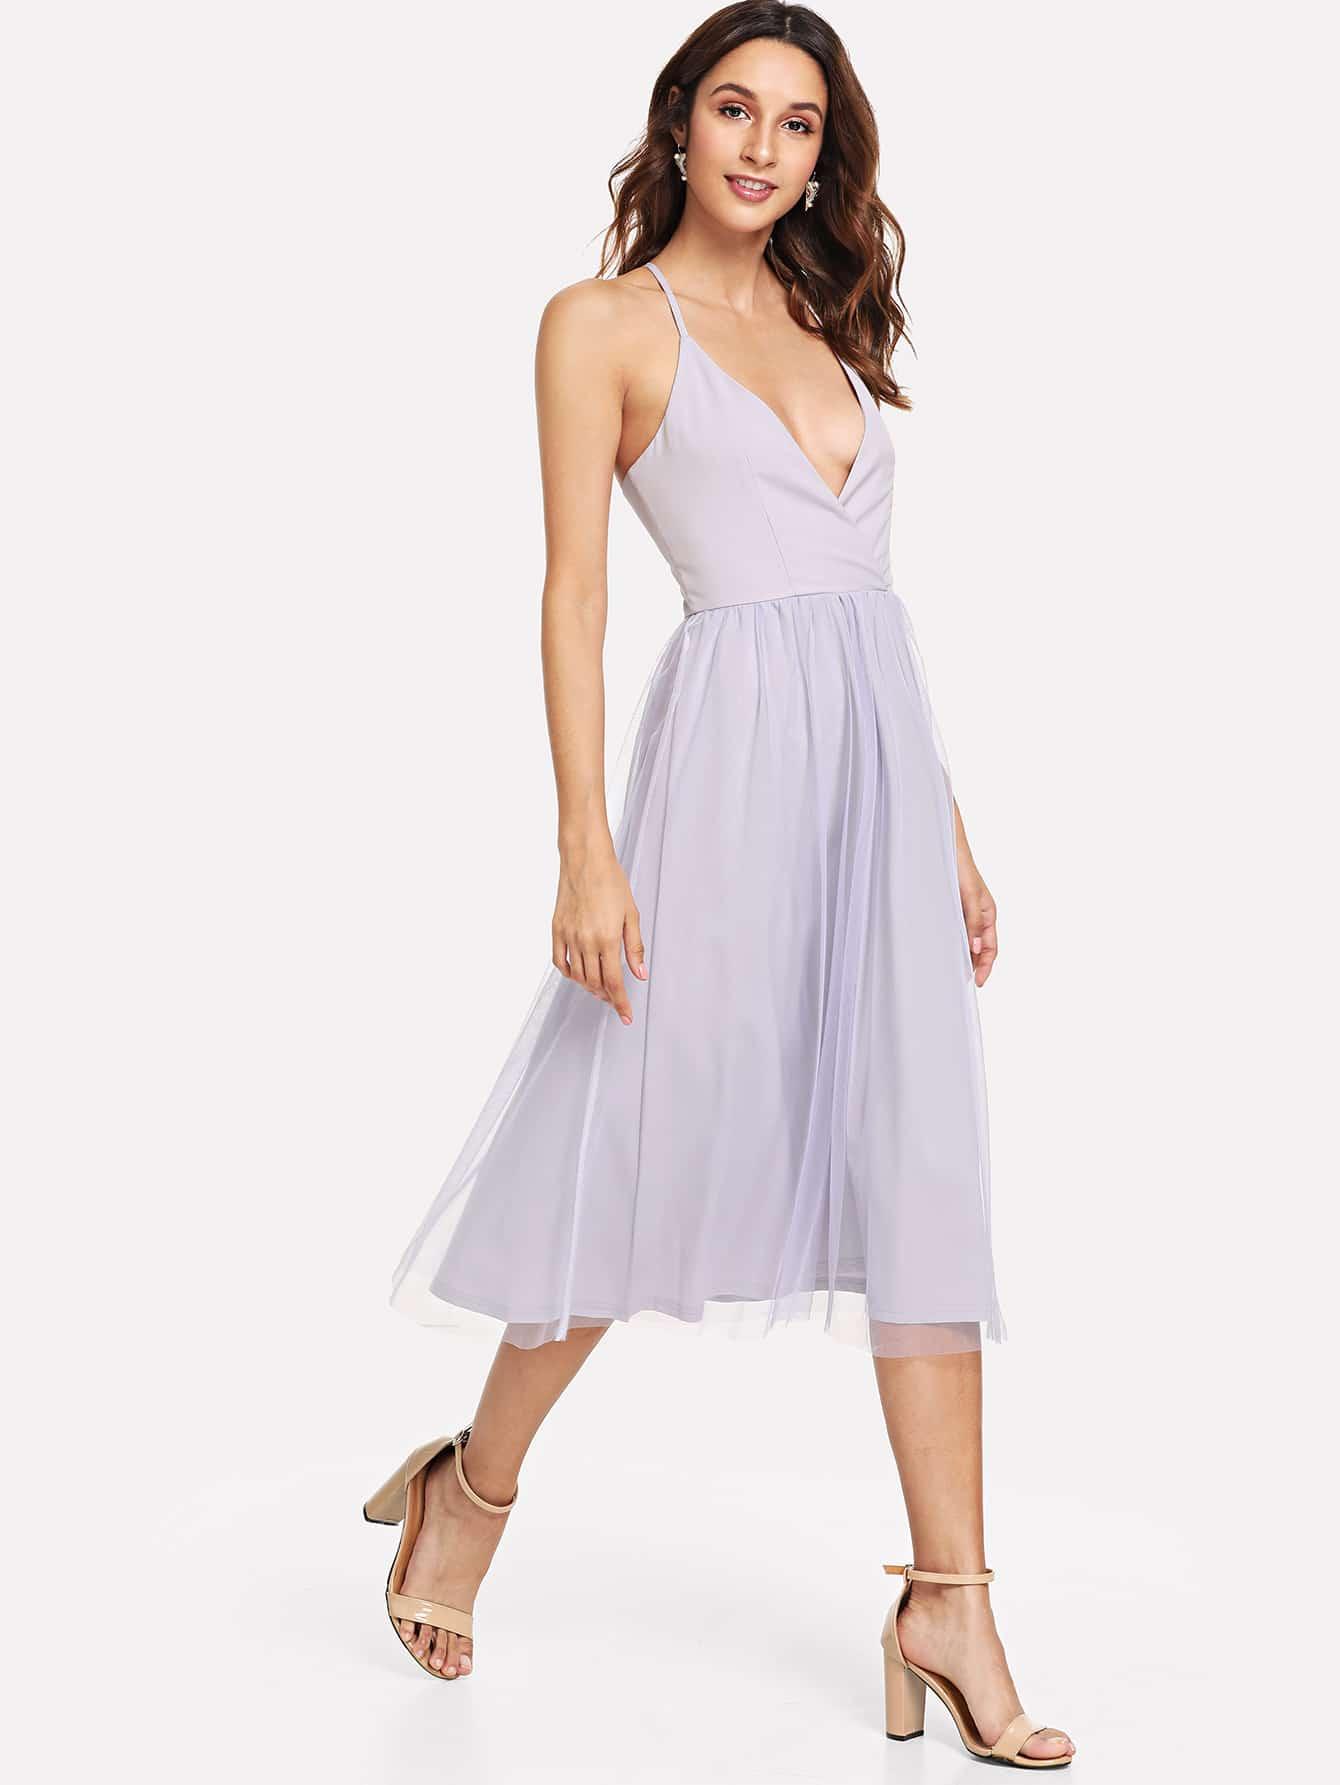 Deep V Neckline Cami Dress b screen b156xw02 v 2 v 0 v 3 v 6 fit b156xtn02 claa156wb11a n156b6 l04 n156b6 l0b bt156gw01 n156bge l21 lp156wh4 tla1 tlc1 b1